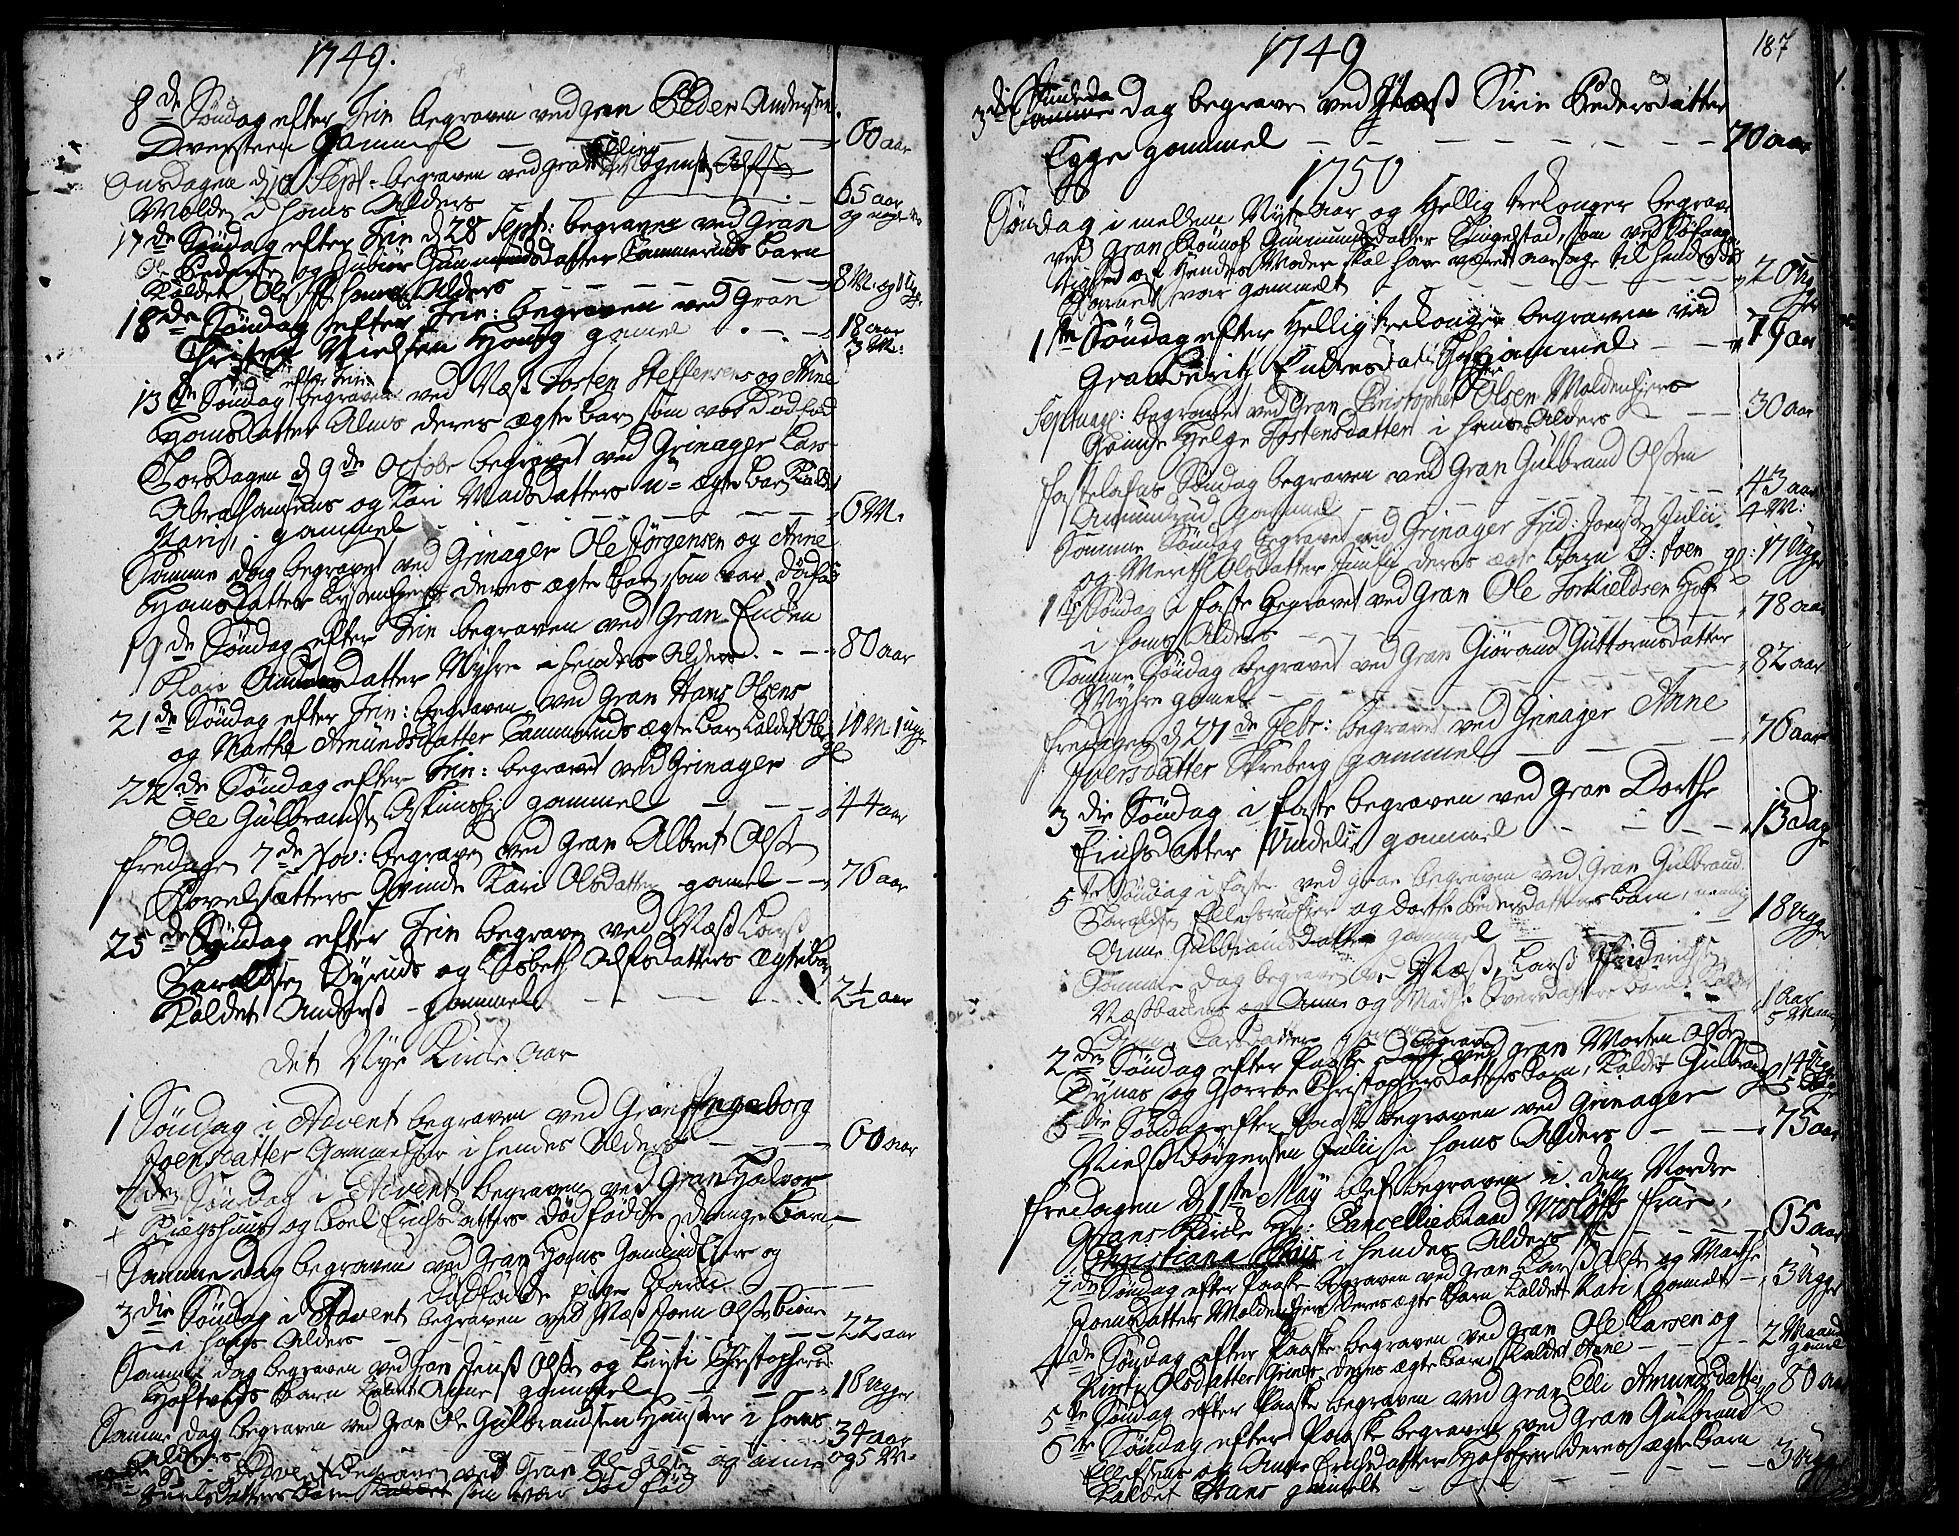 SAH, Gran prestekontor, Ministerialbok nr. 3, 1745-1758, s. 187